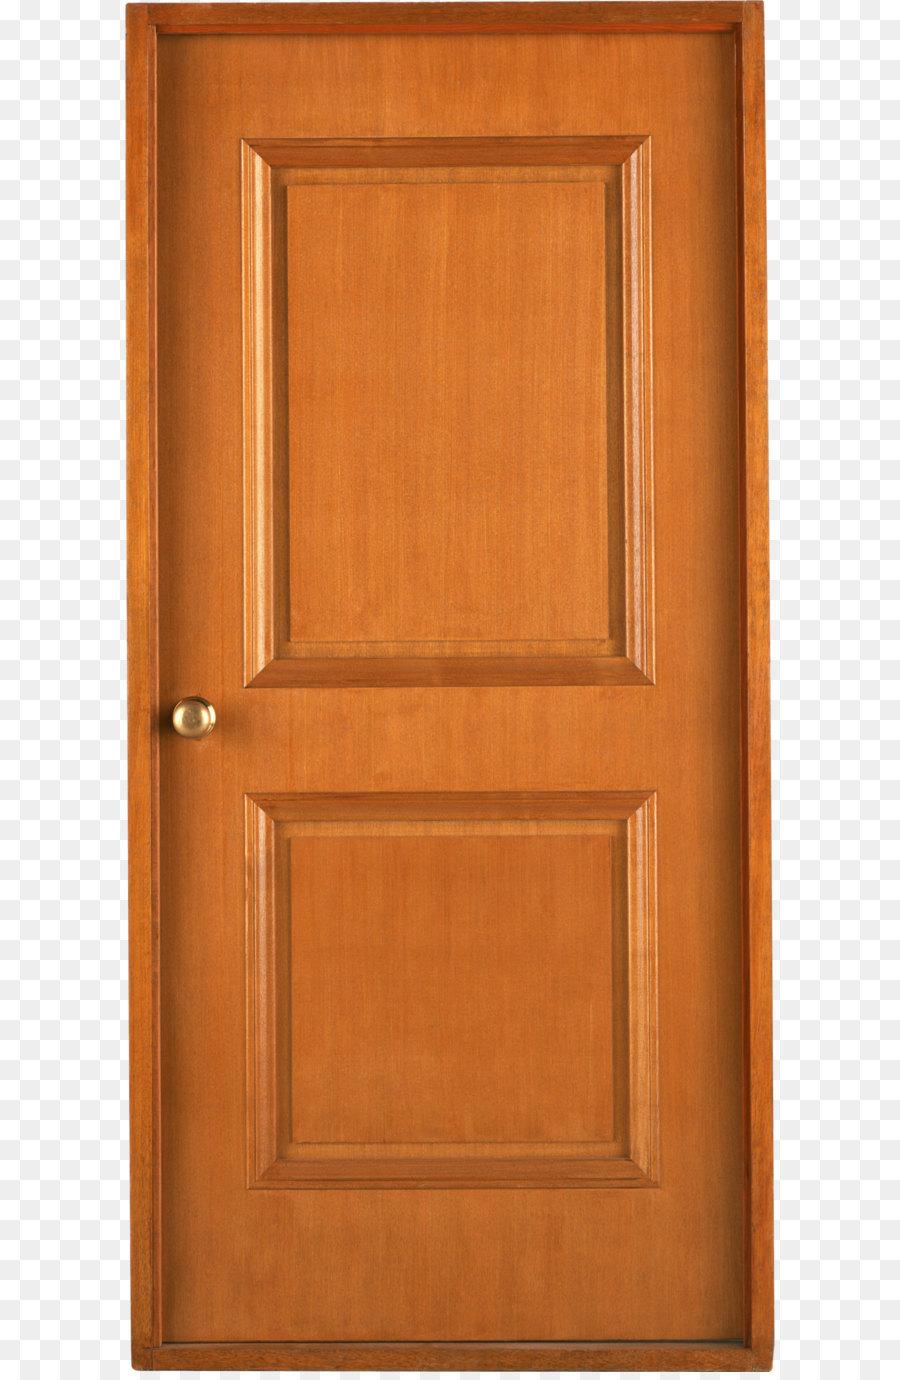 Door Icon - Wood door PNG & Door Icon - Wood door PNG png download - 1279*2699 - Free ...